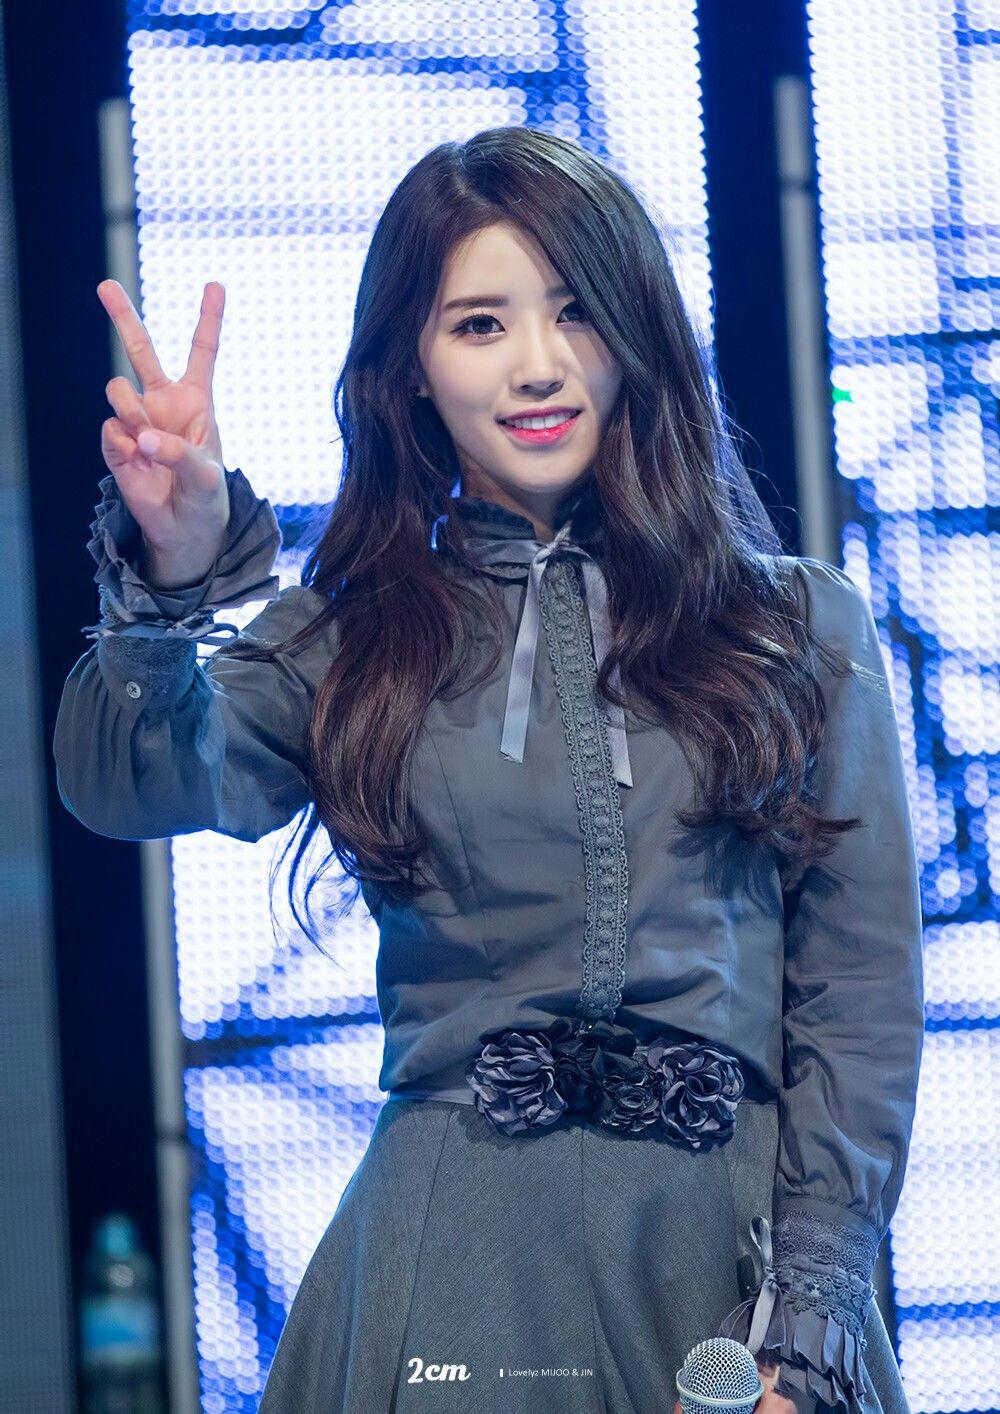 Lovelyz Mijoo | 아시아의 아름다움, 아름다운 아시아 소녀, 아름다운